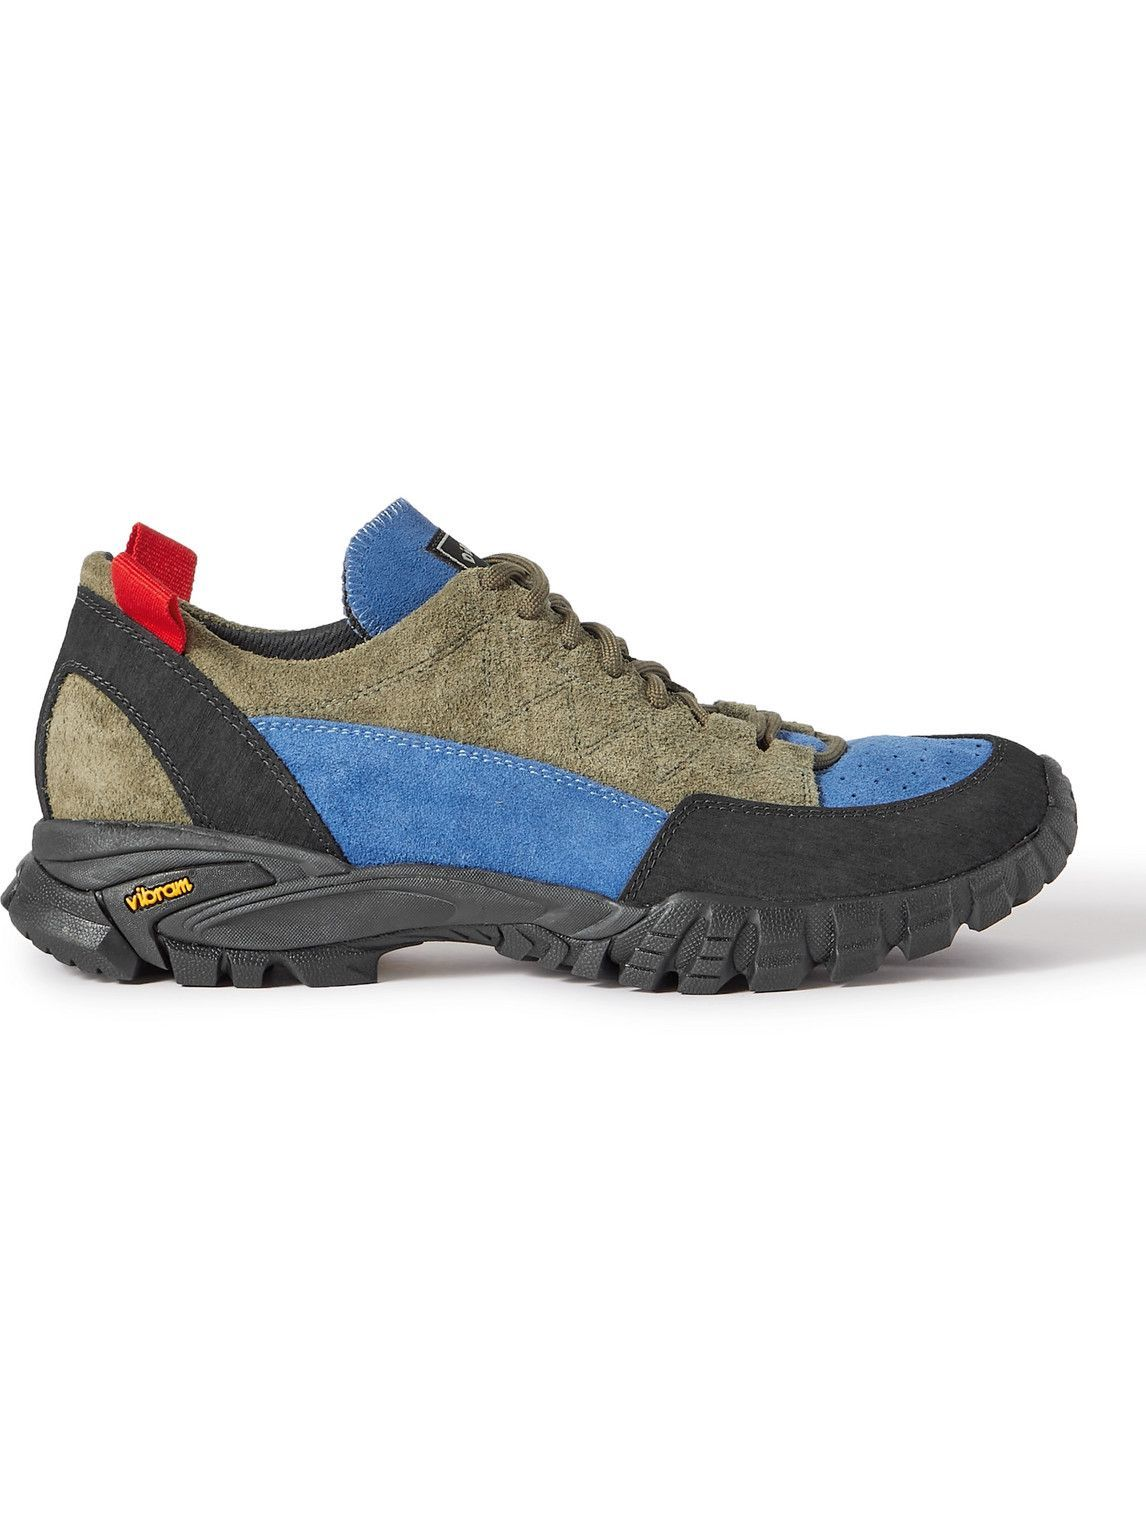 Photo: Diemme - Possagno Panelled Suede Sneakers - Blue